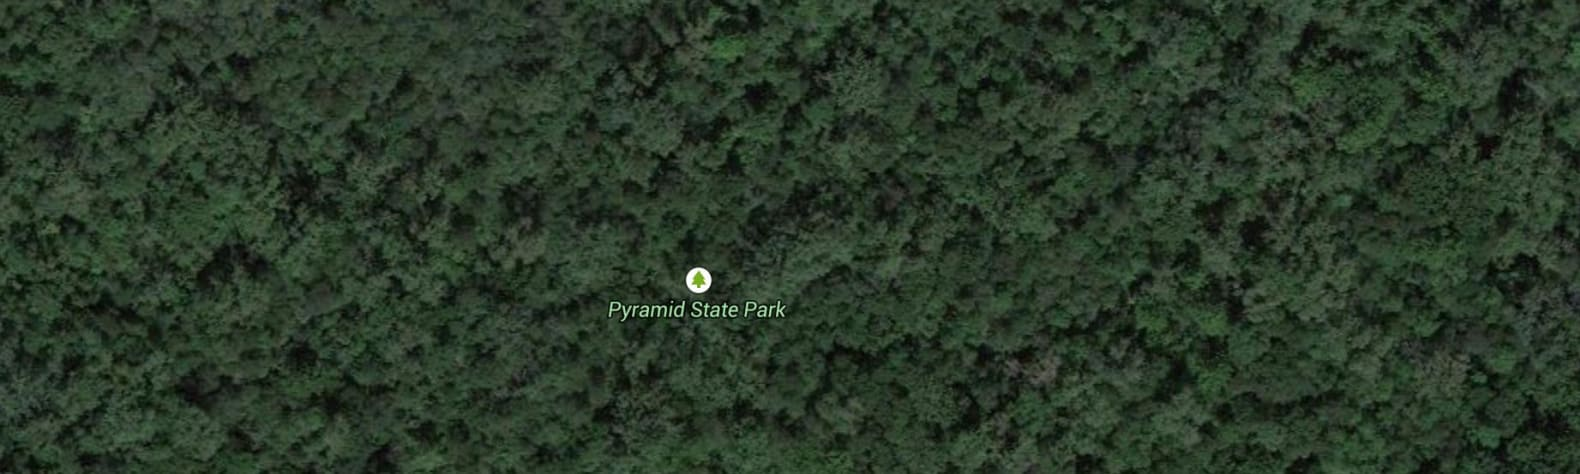 Pyramid State Recreation Area